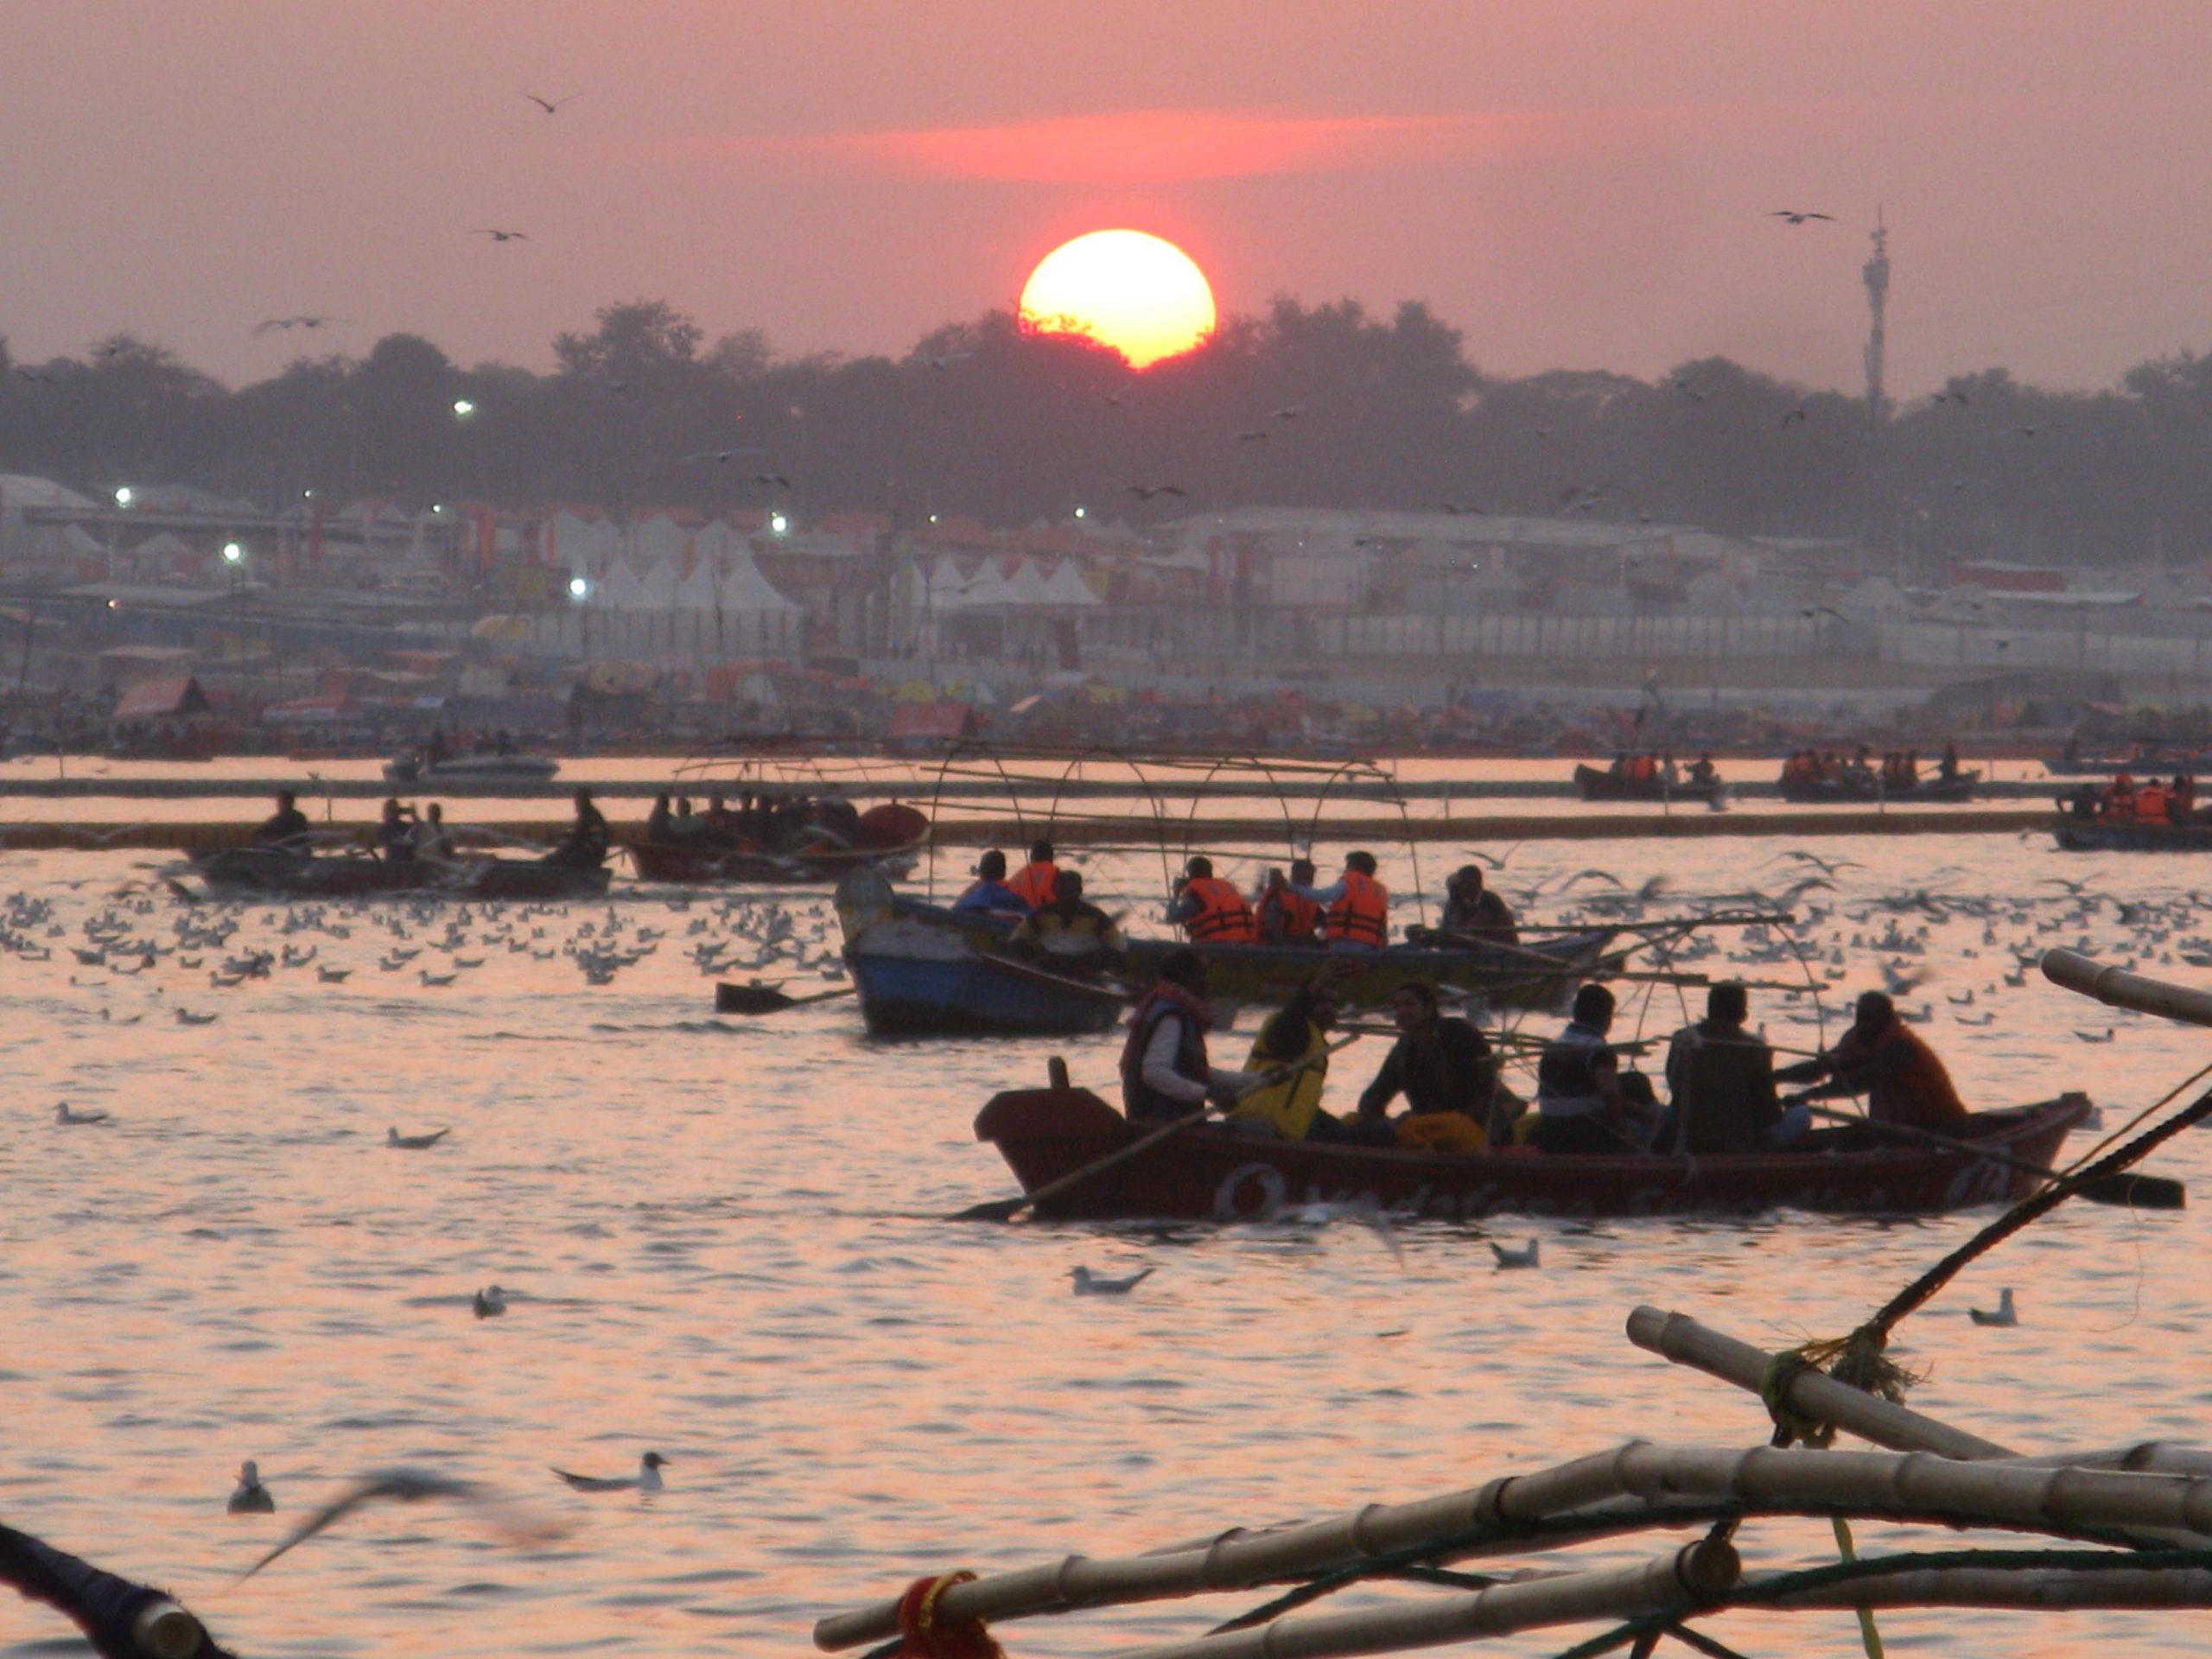 Prayagraj during evening hours